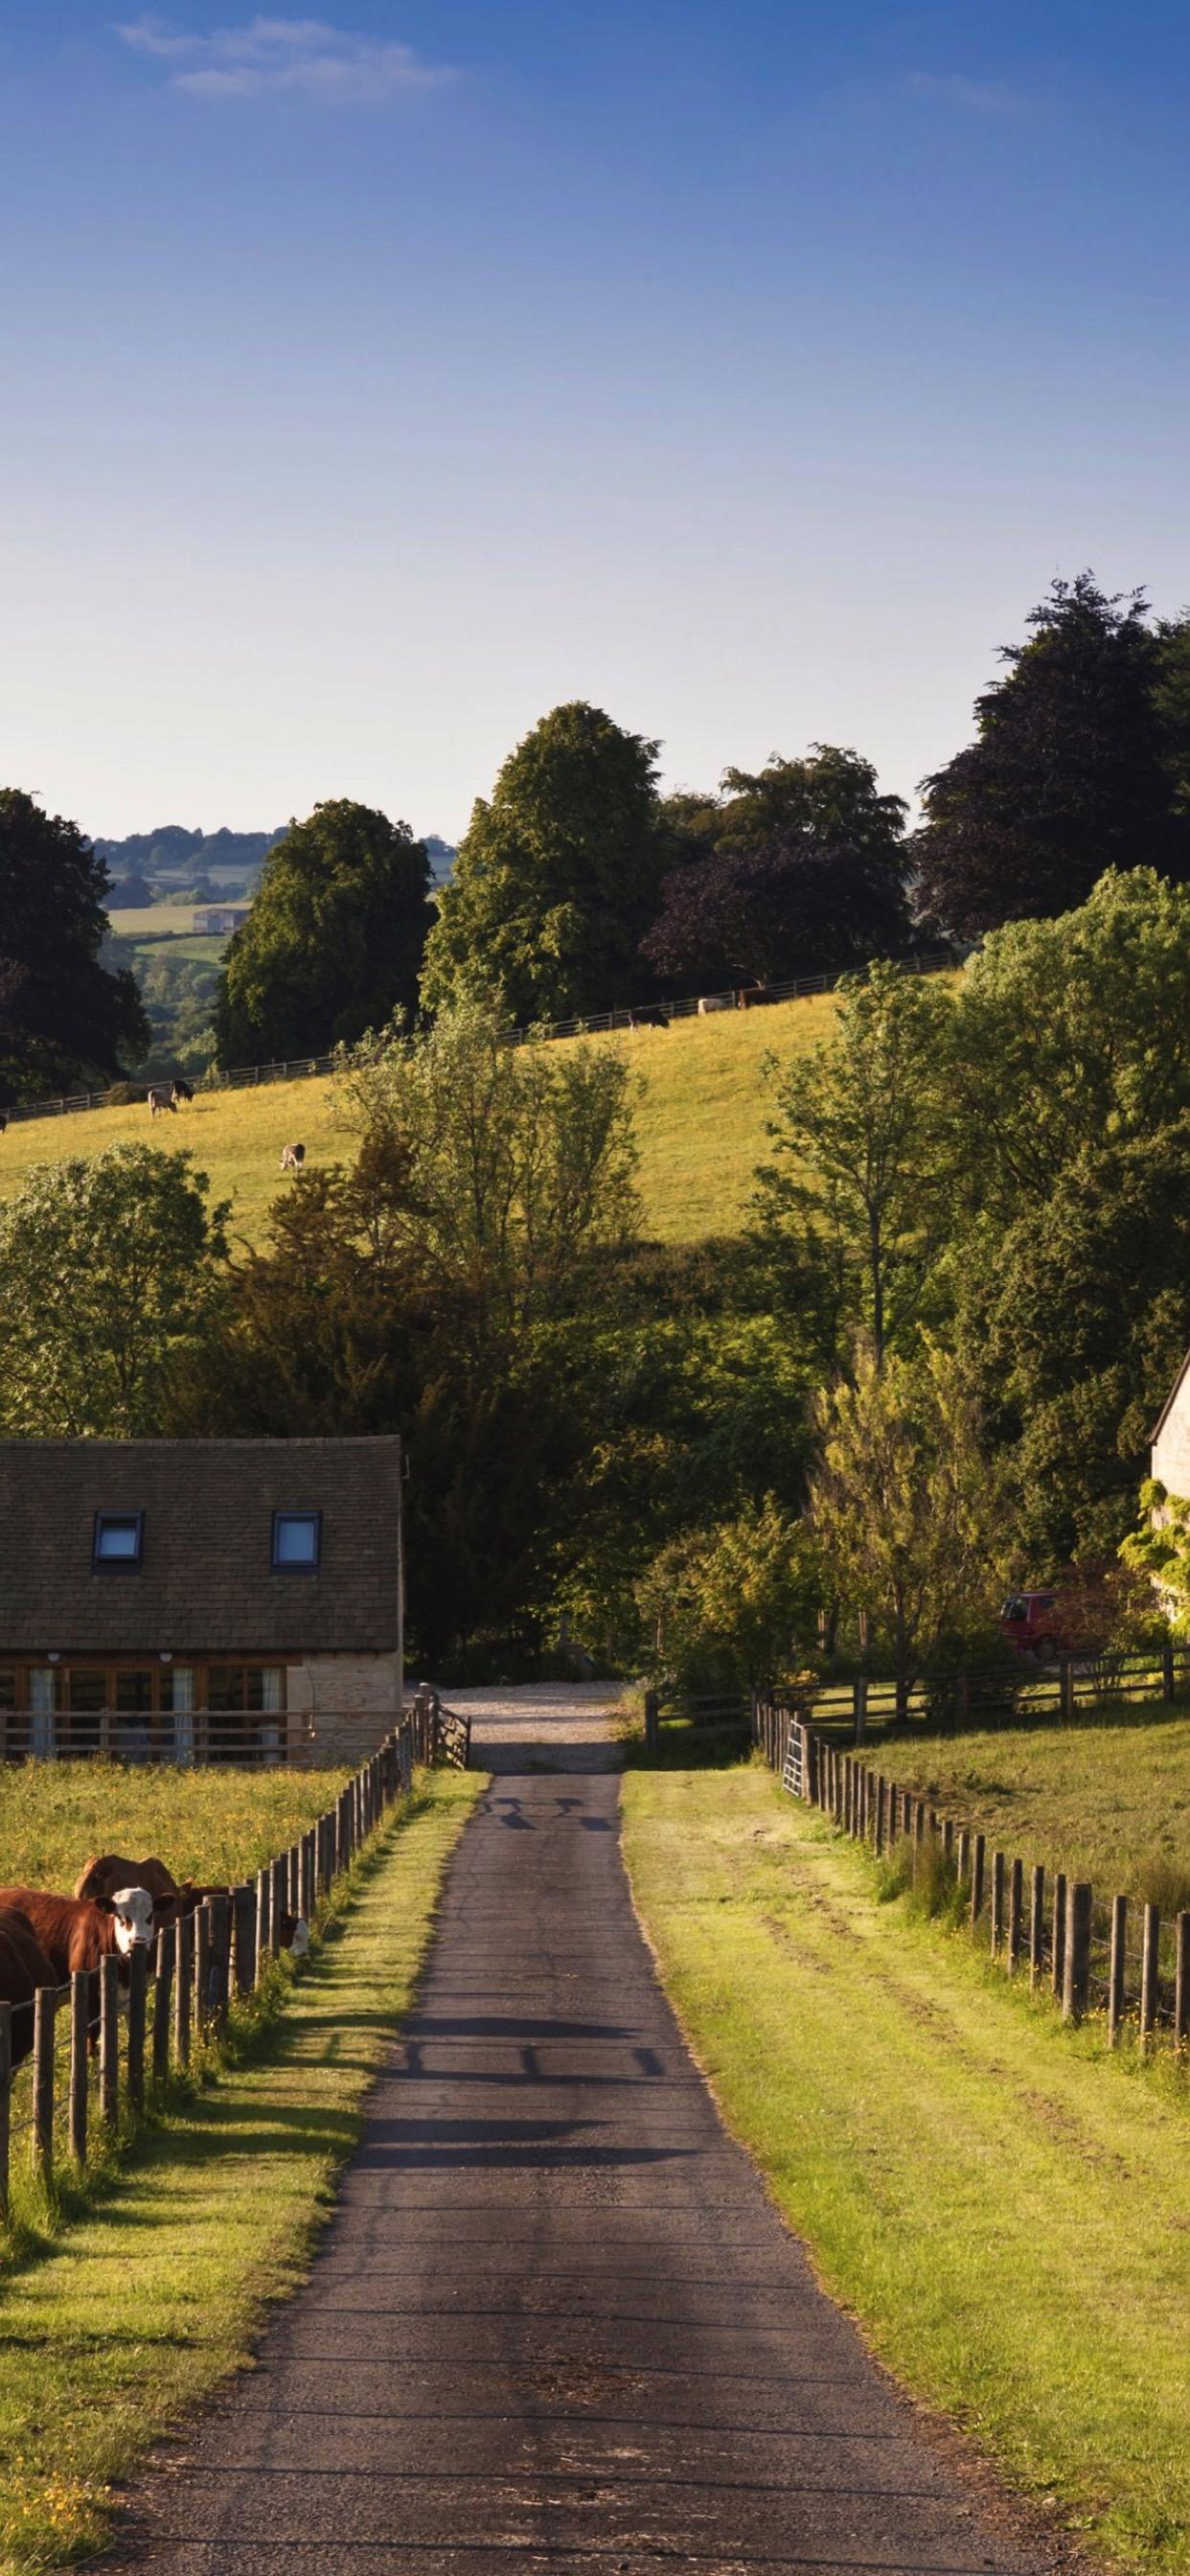 Landscape Farm Green Cow Wallpaper Sc Iphone Xs Max